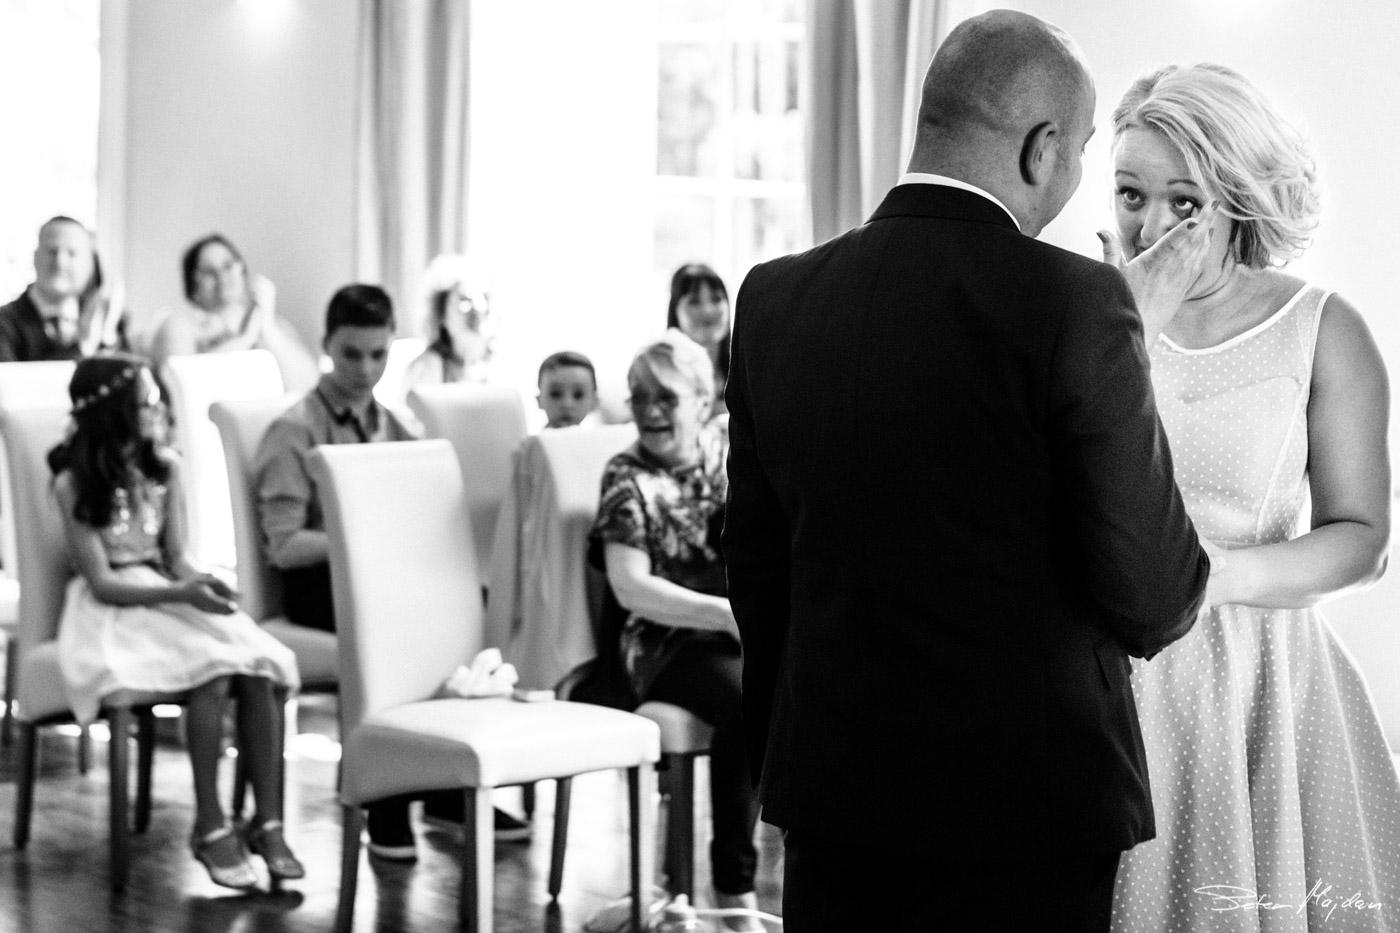 Colwick-hall-wedding-photography-22.jpg